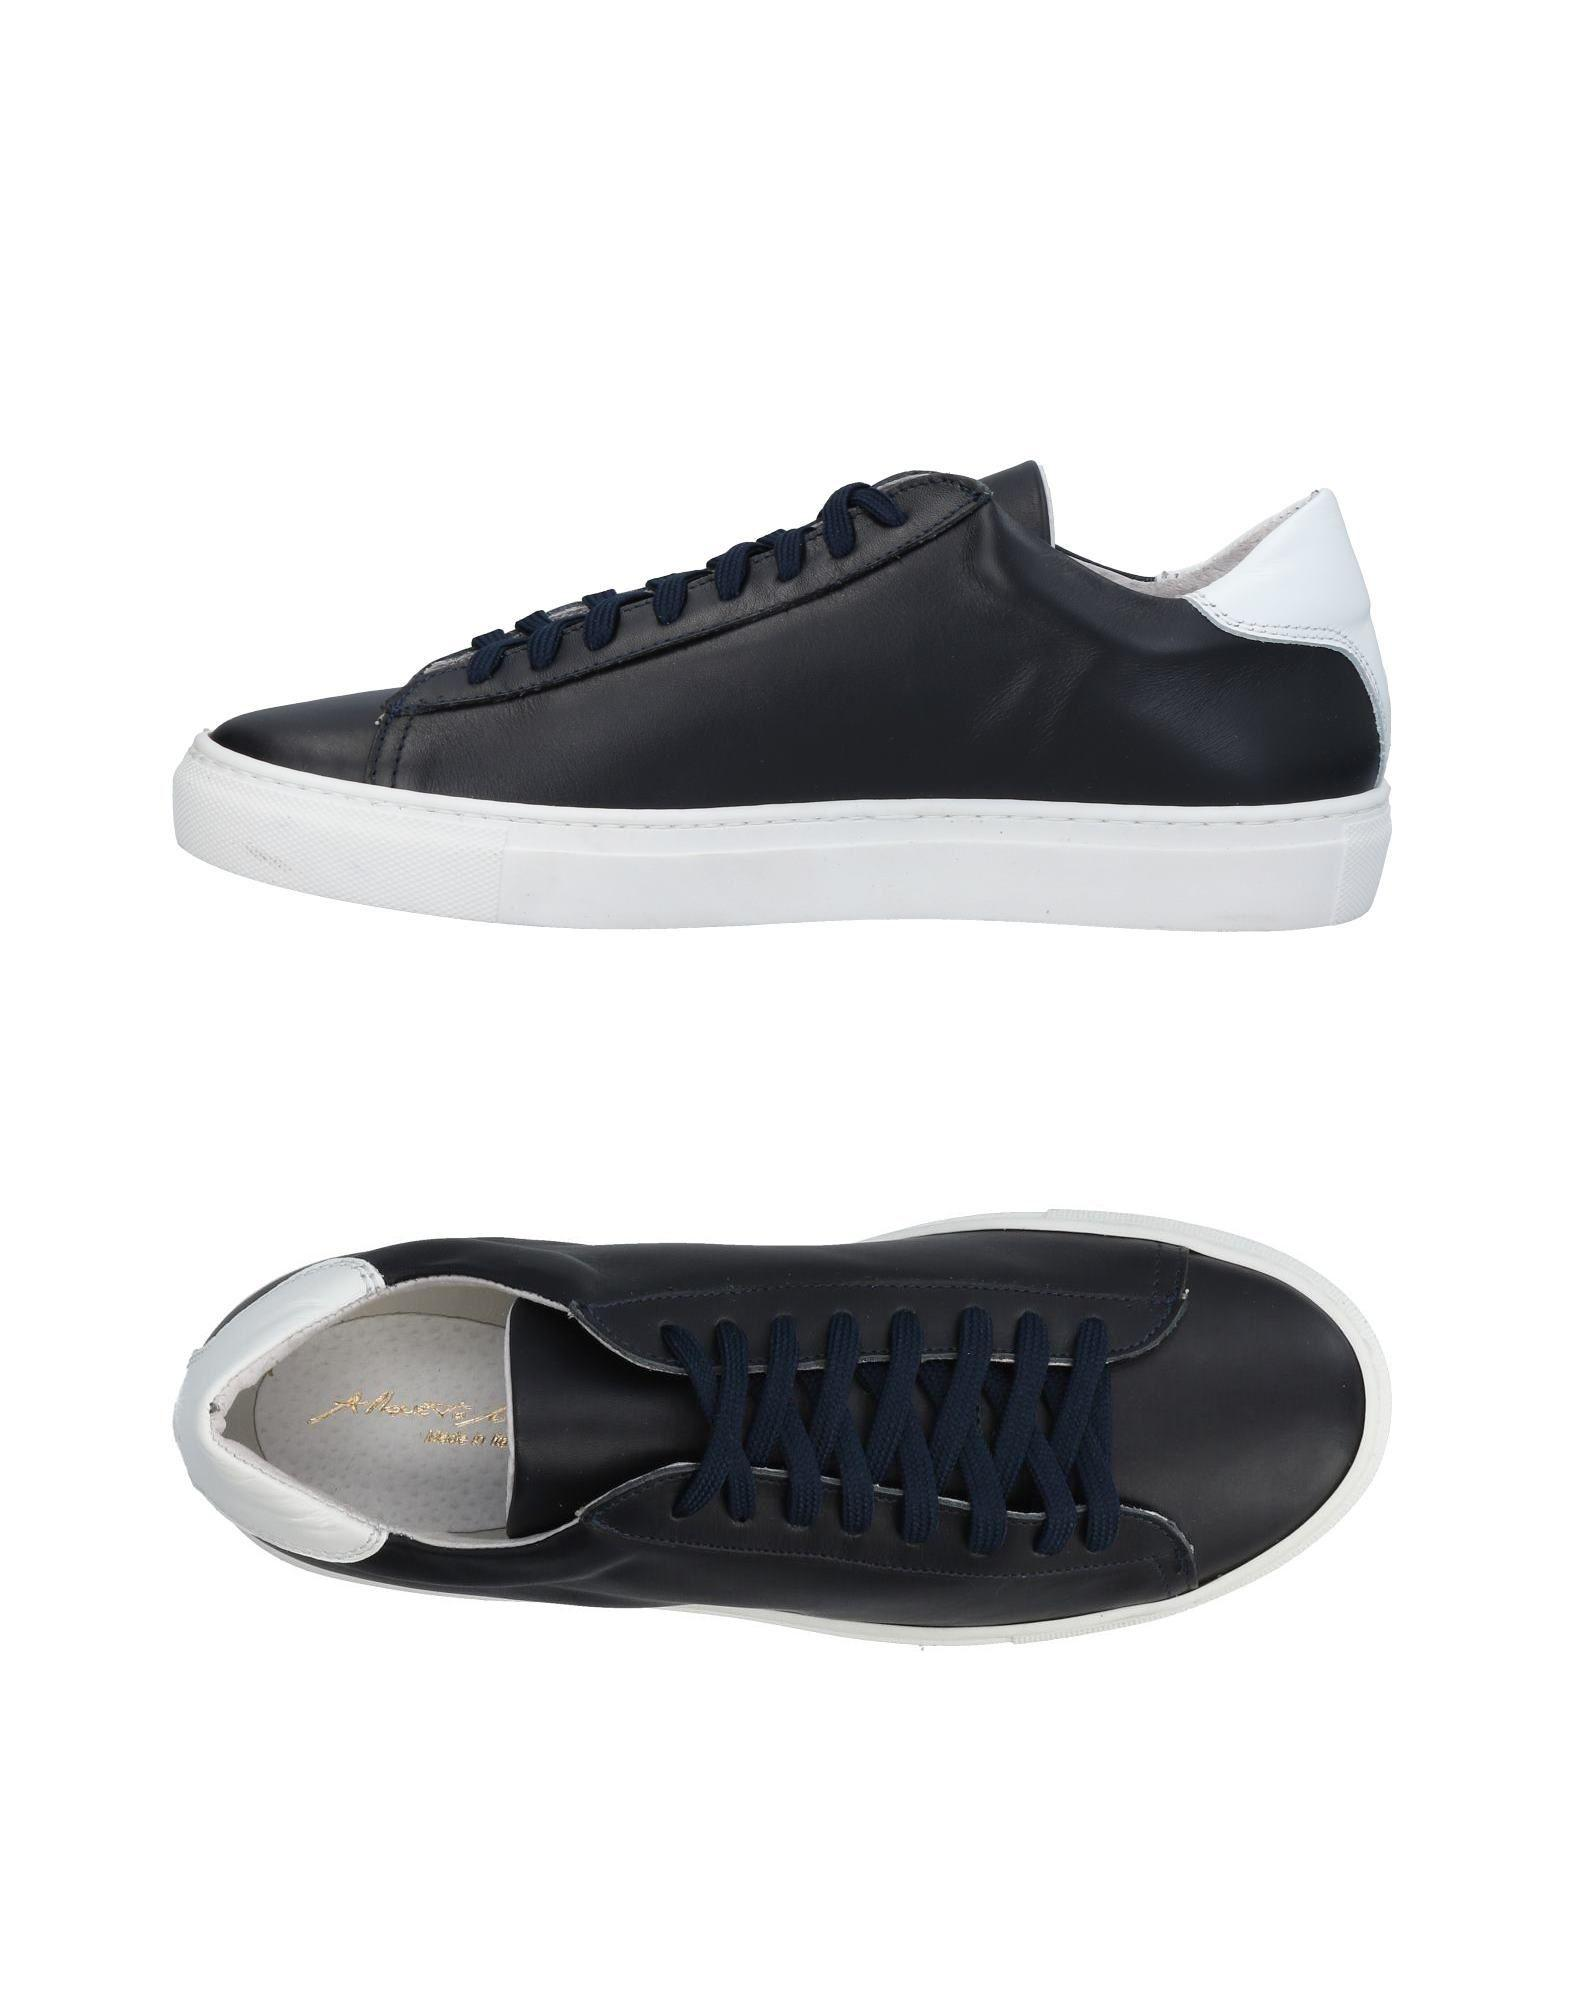 FOOTWEAR - Low-tops & sneakers Alberto Moretti R4yPlw